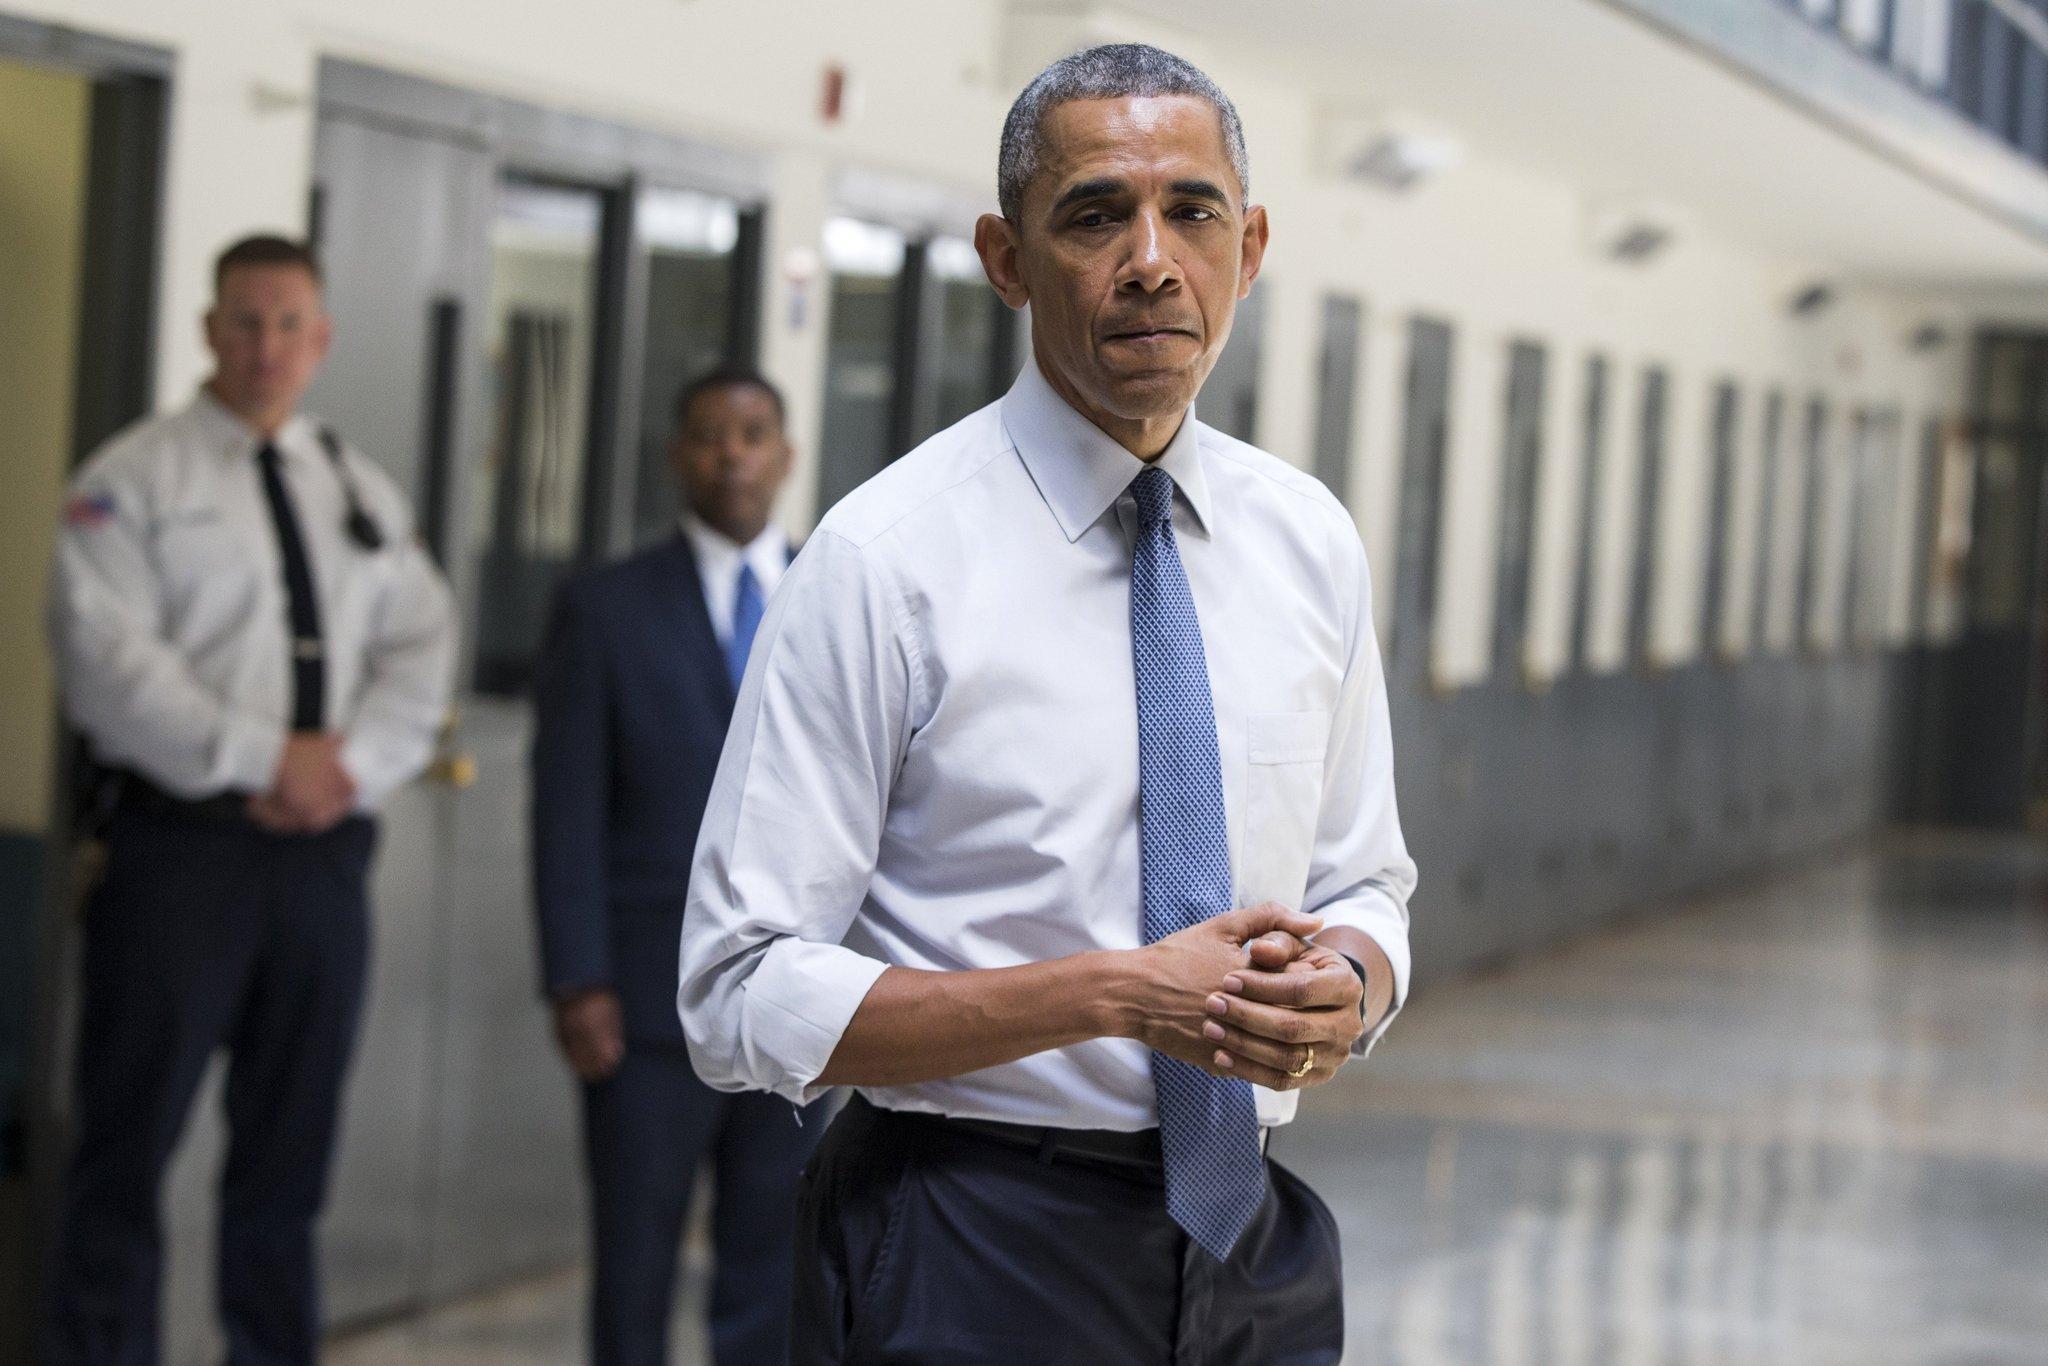 ct-obama-prison-visit-20150716